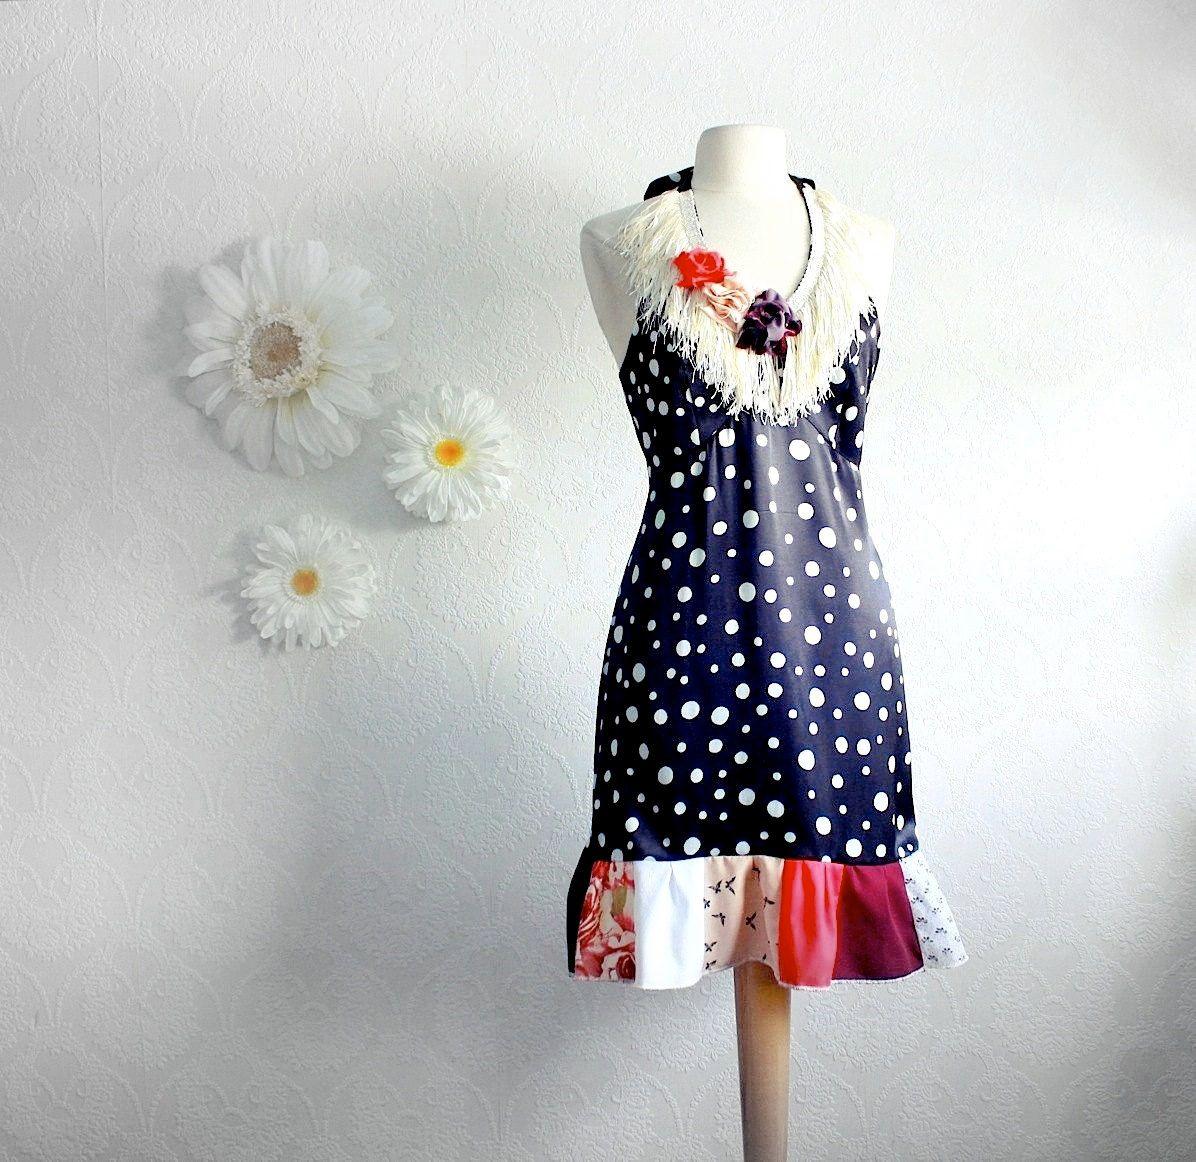 bonne idée pour rallonger une robe !! - Women's Black and White Polka Dot Halter Dress Upcycled Clothing Bohemian Patchwork Boho Fringe Hippie Clothes